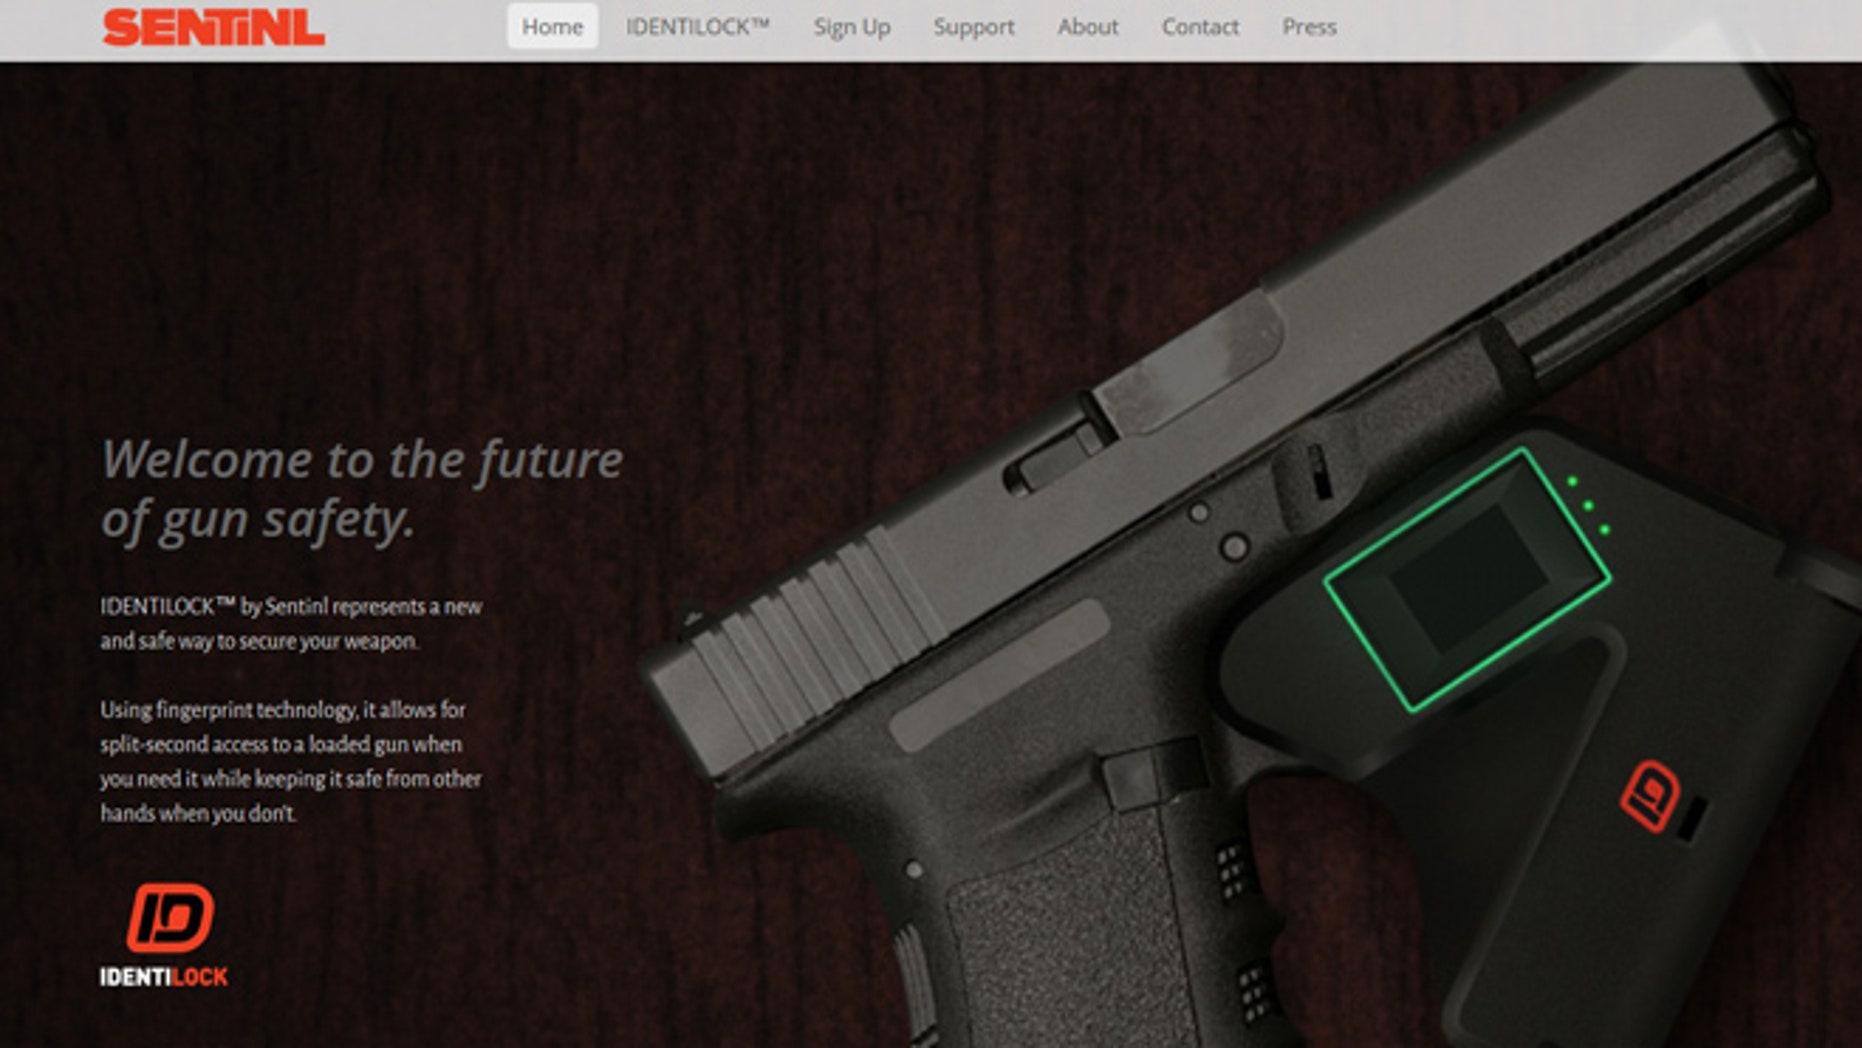 A screenshot of Indentilock's website.